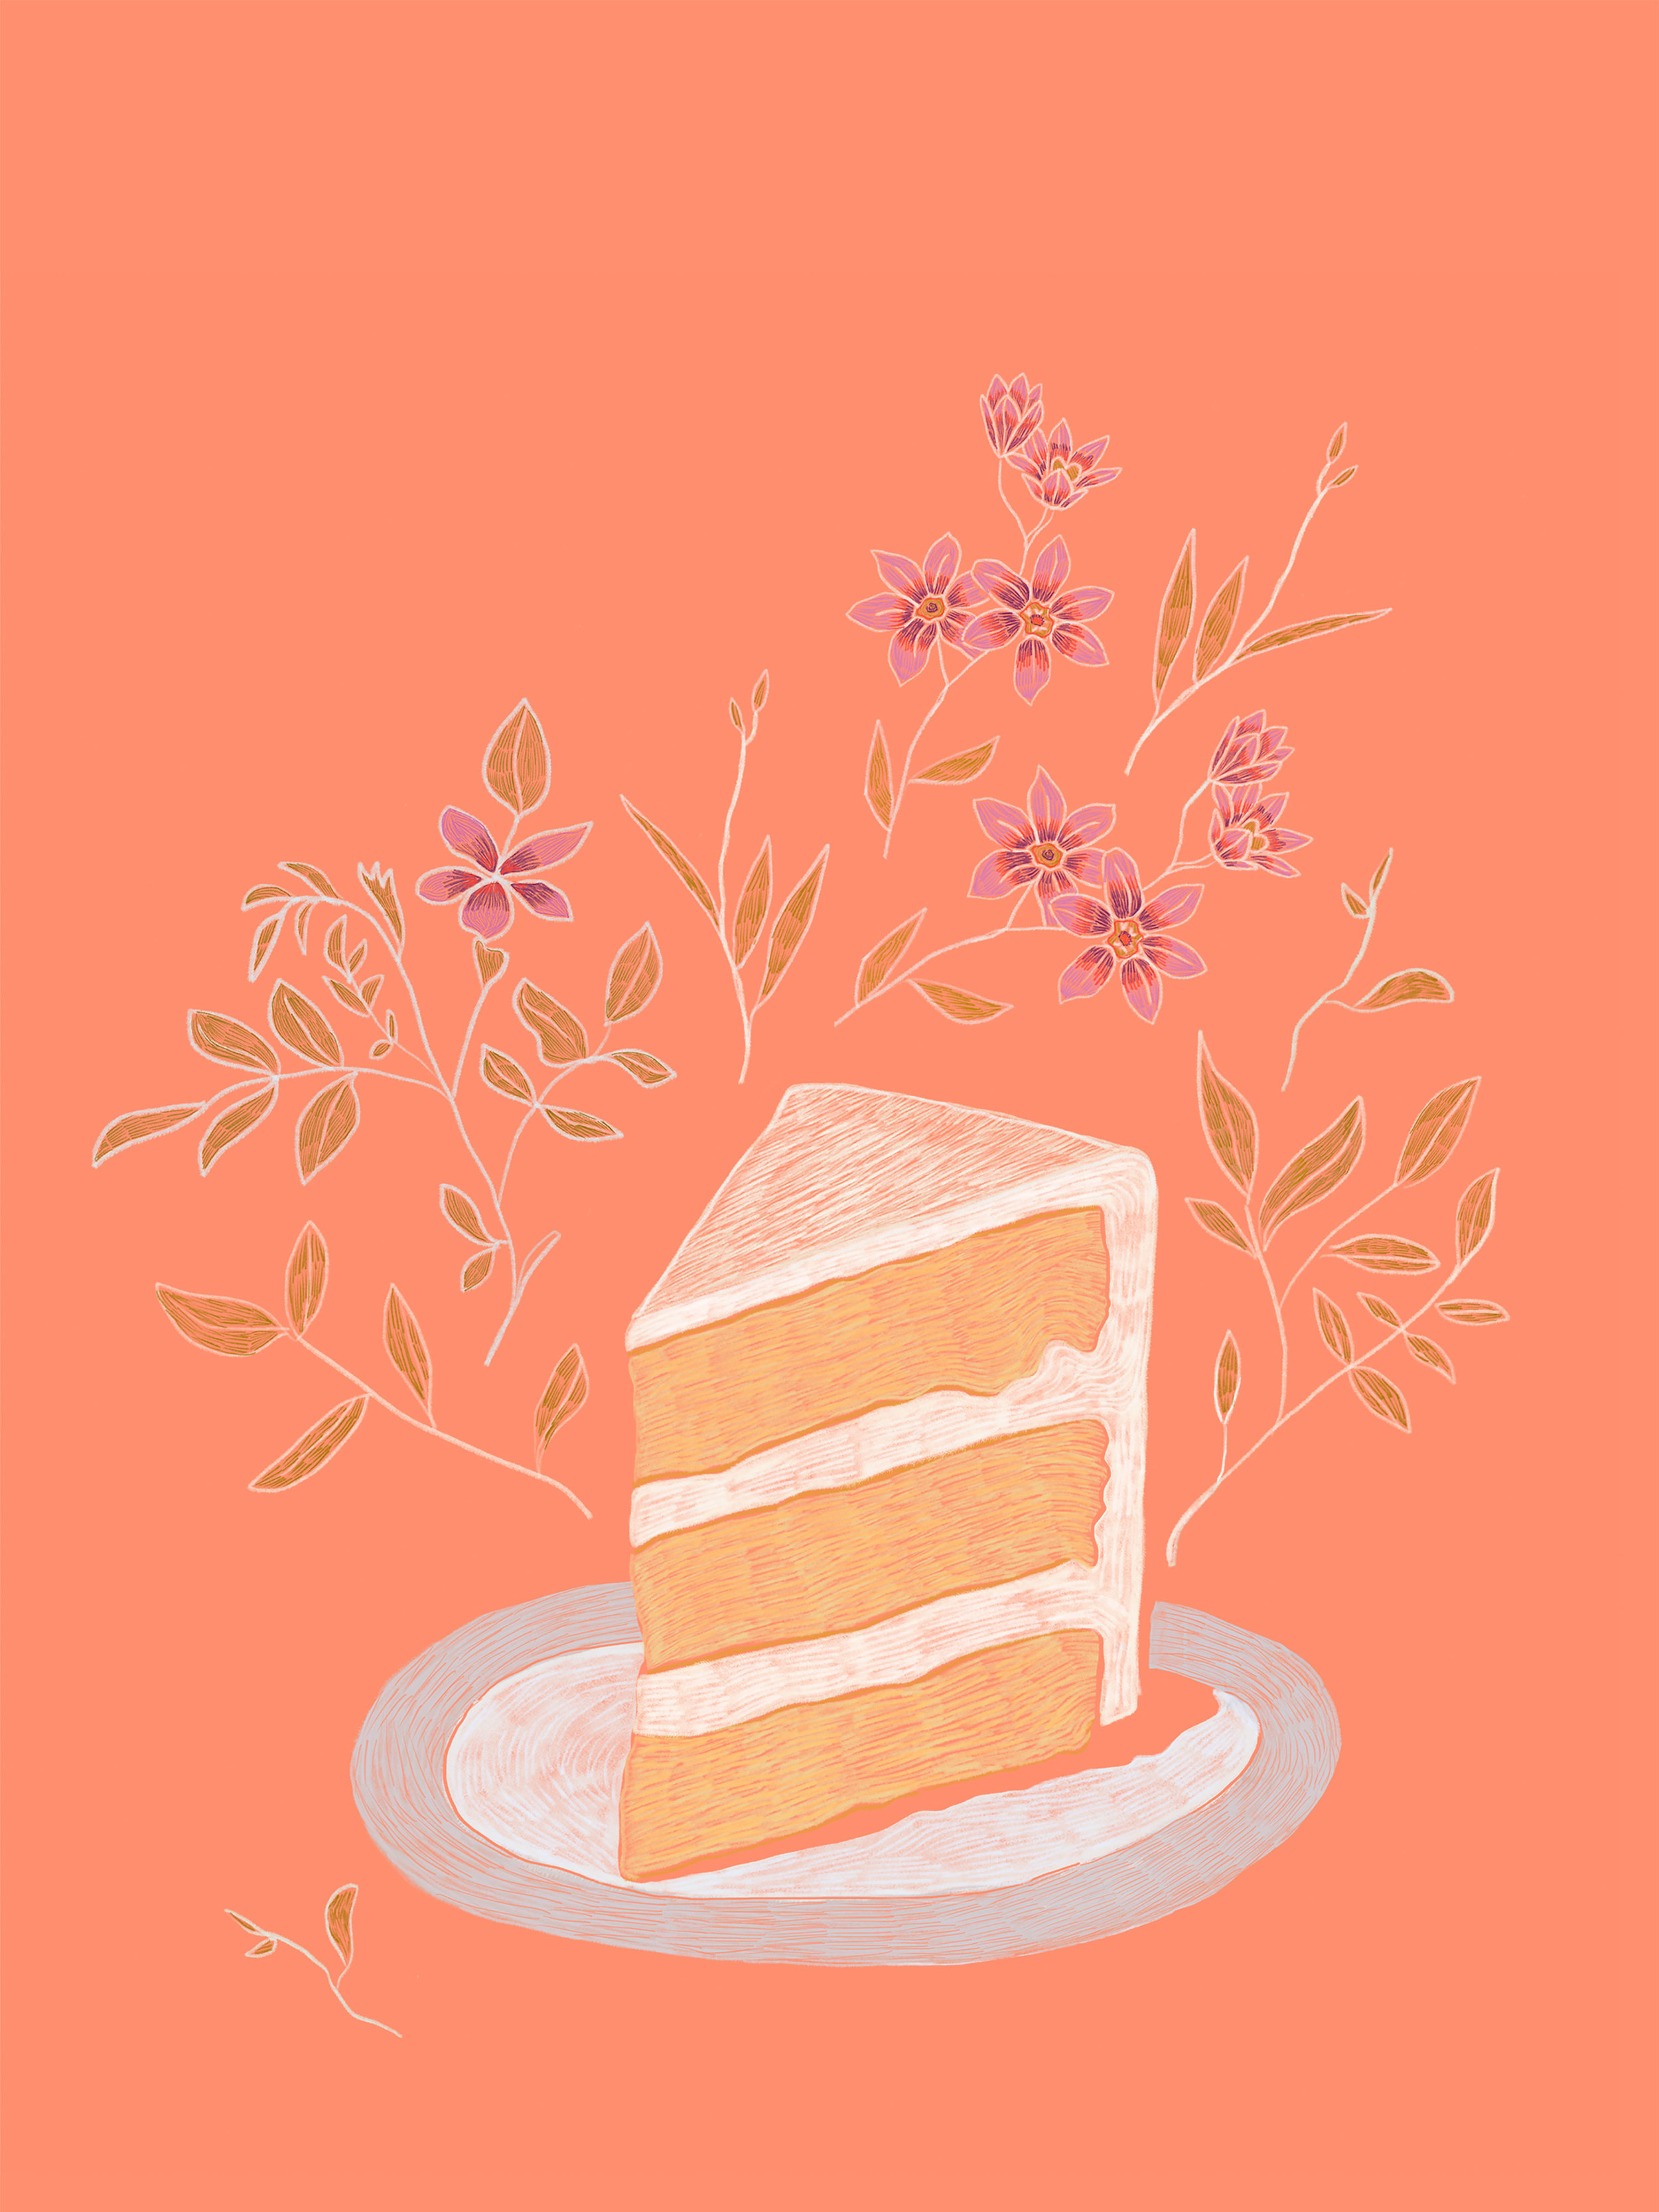 LD_Cake.jpg